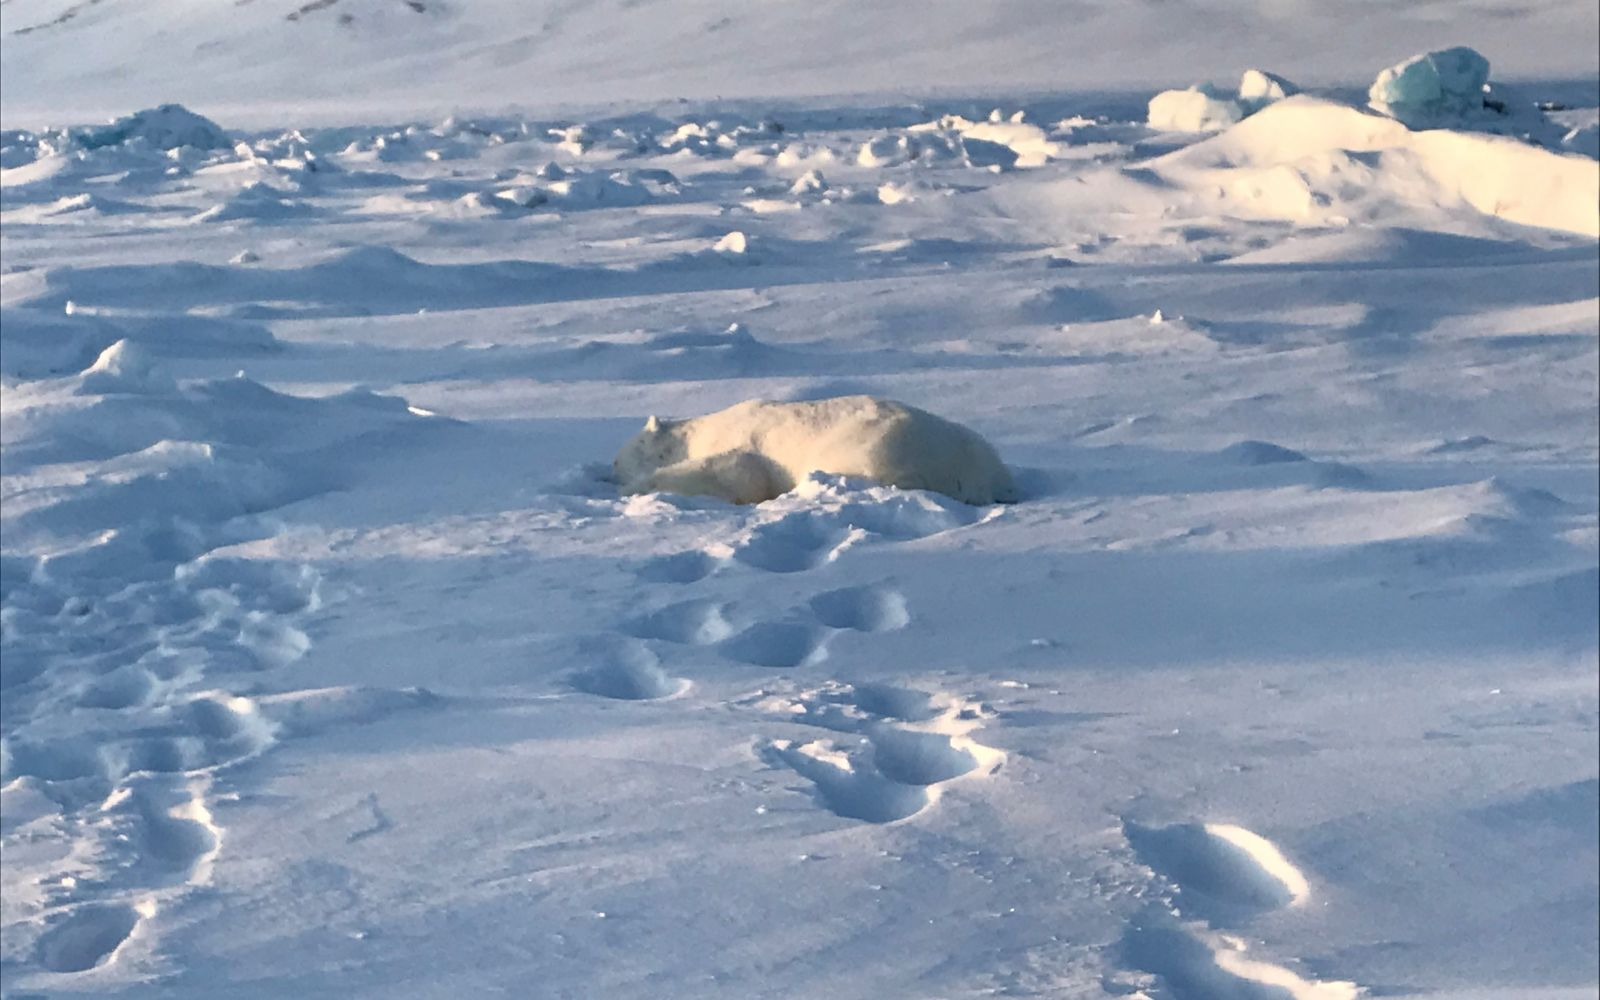 Polar Bear Killed In Svalbard Attack - Life in Norway